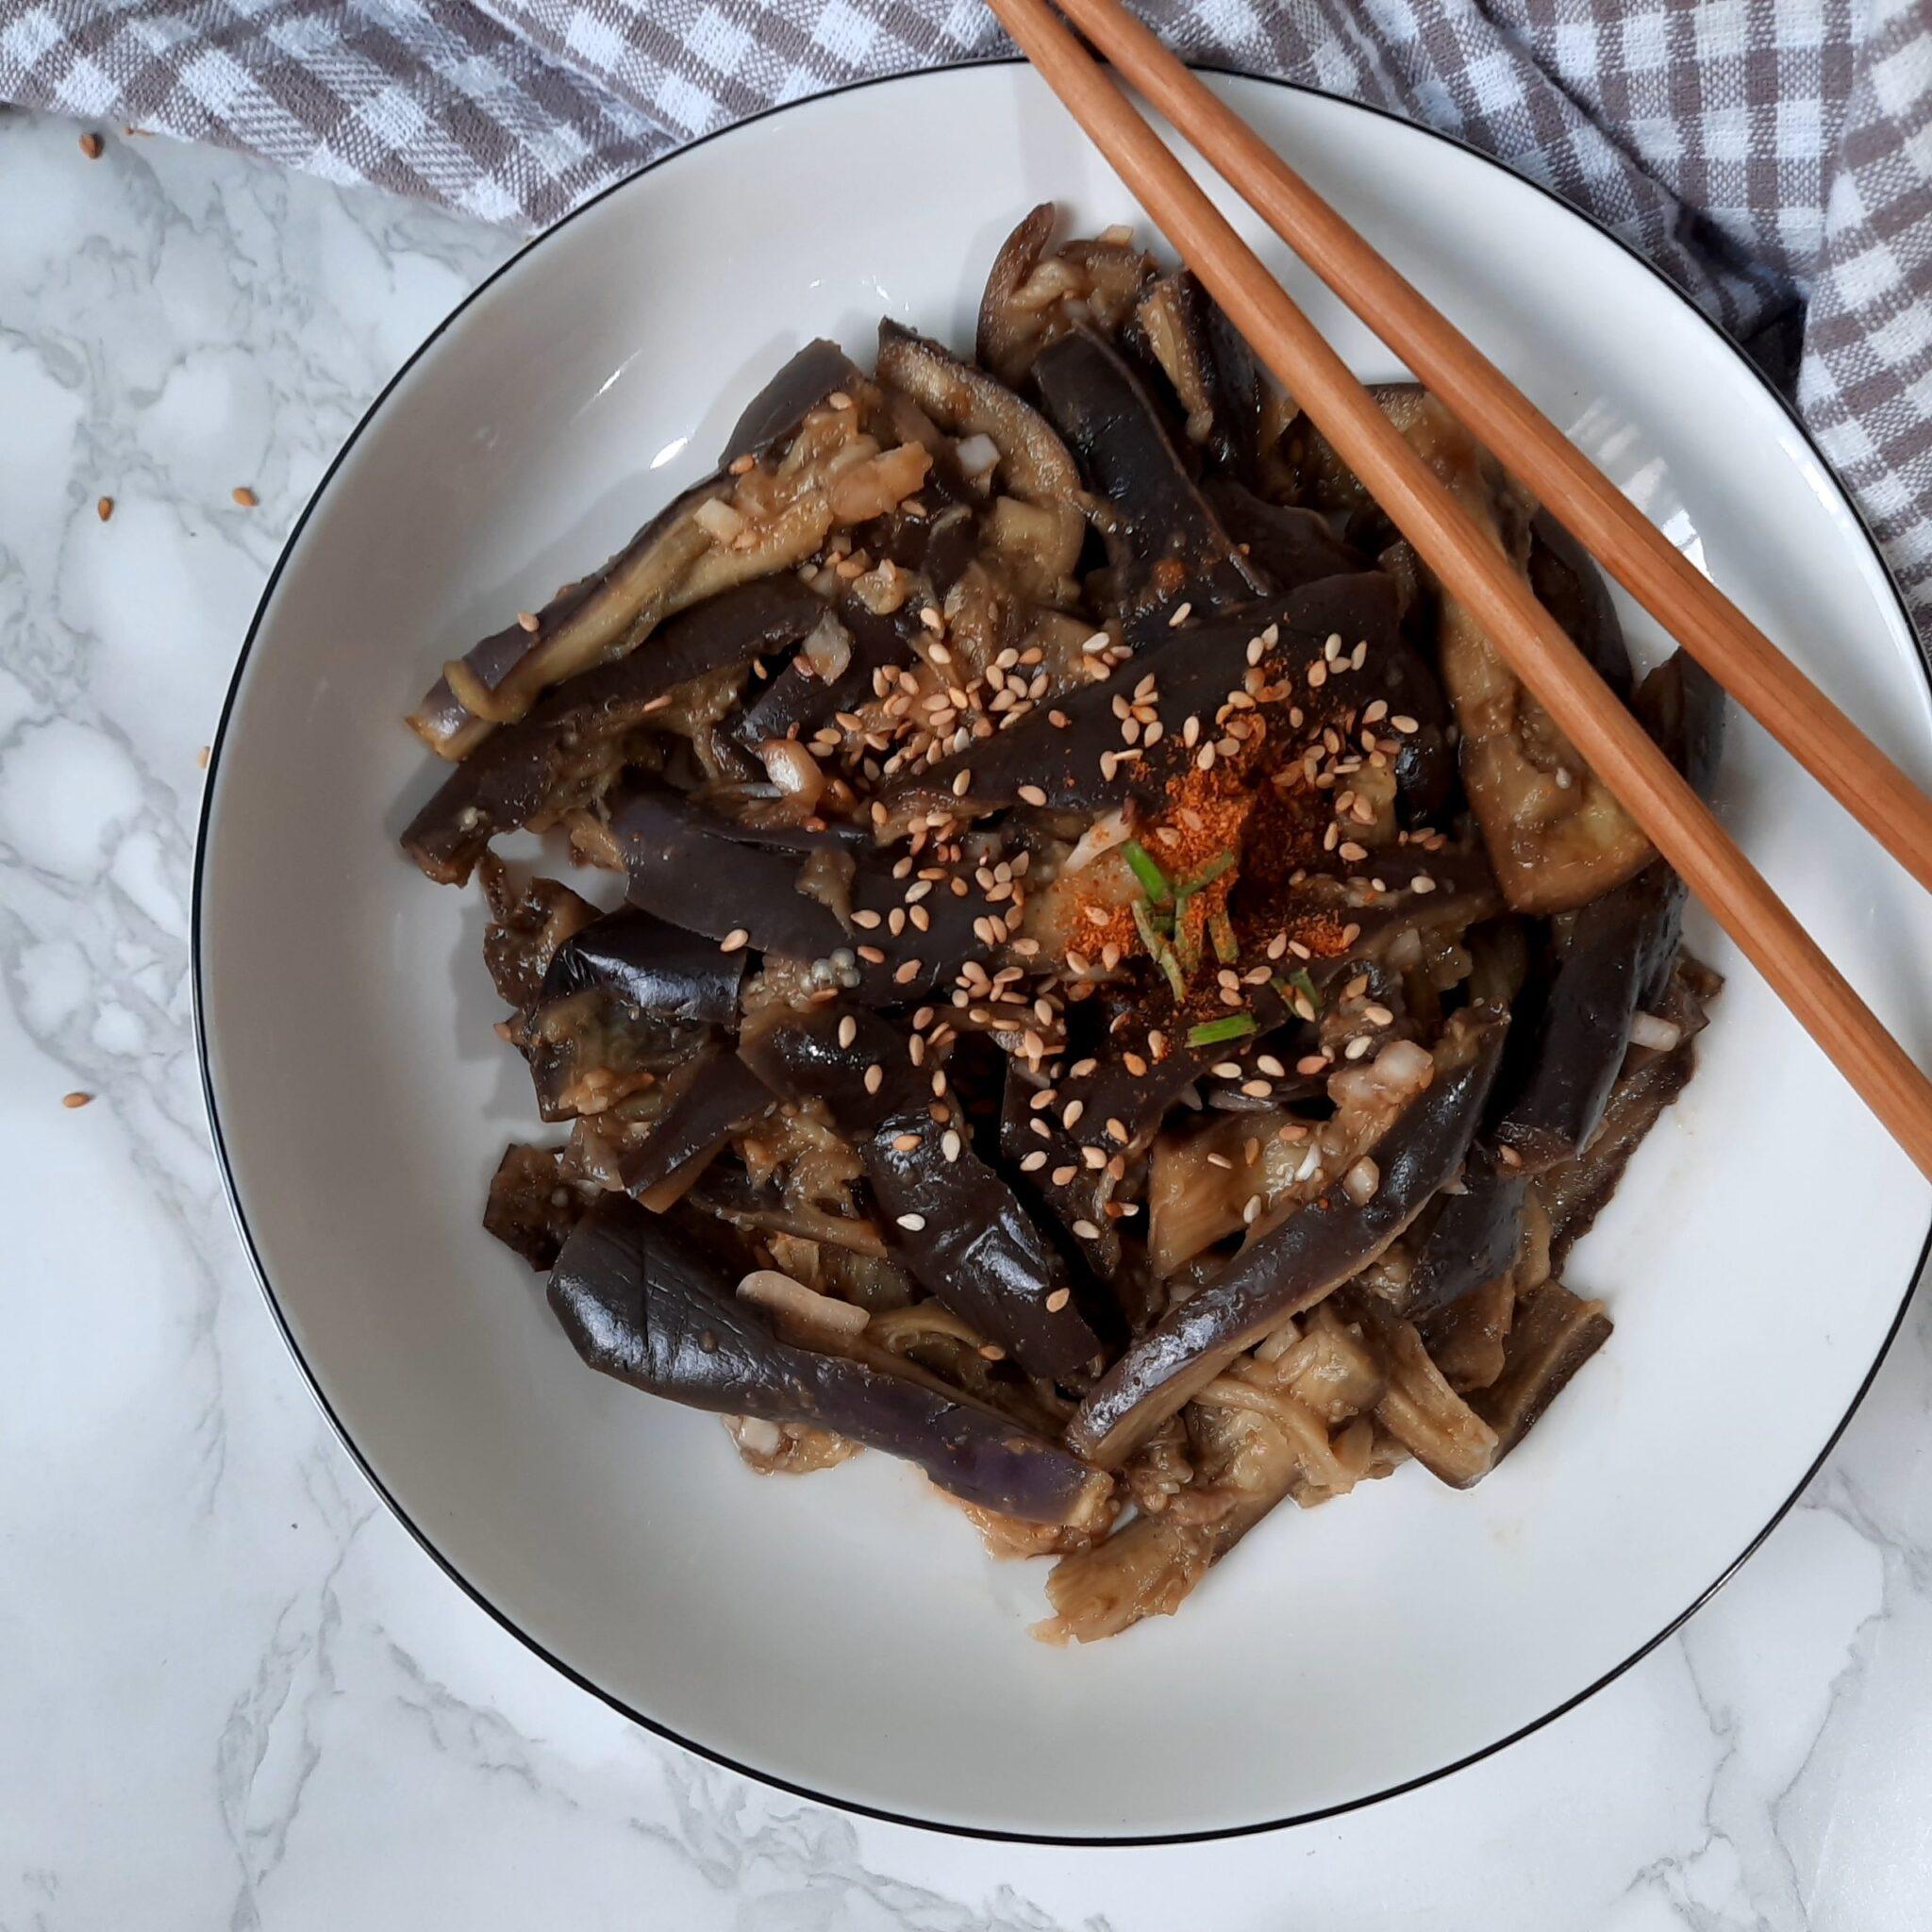 Gaji-namul – Steamed eggplant and soy sauce